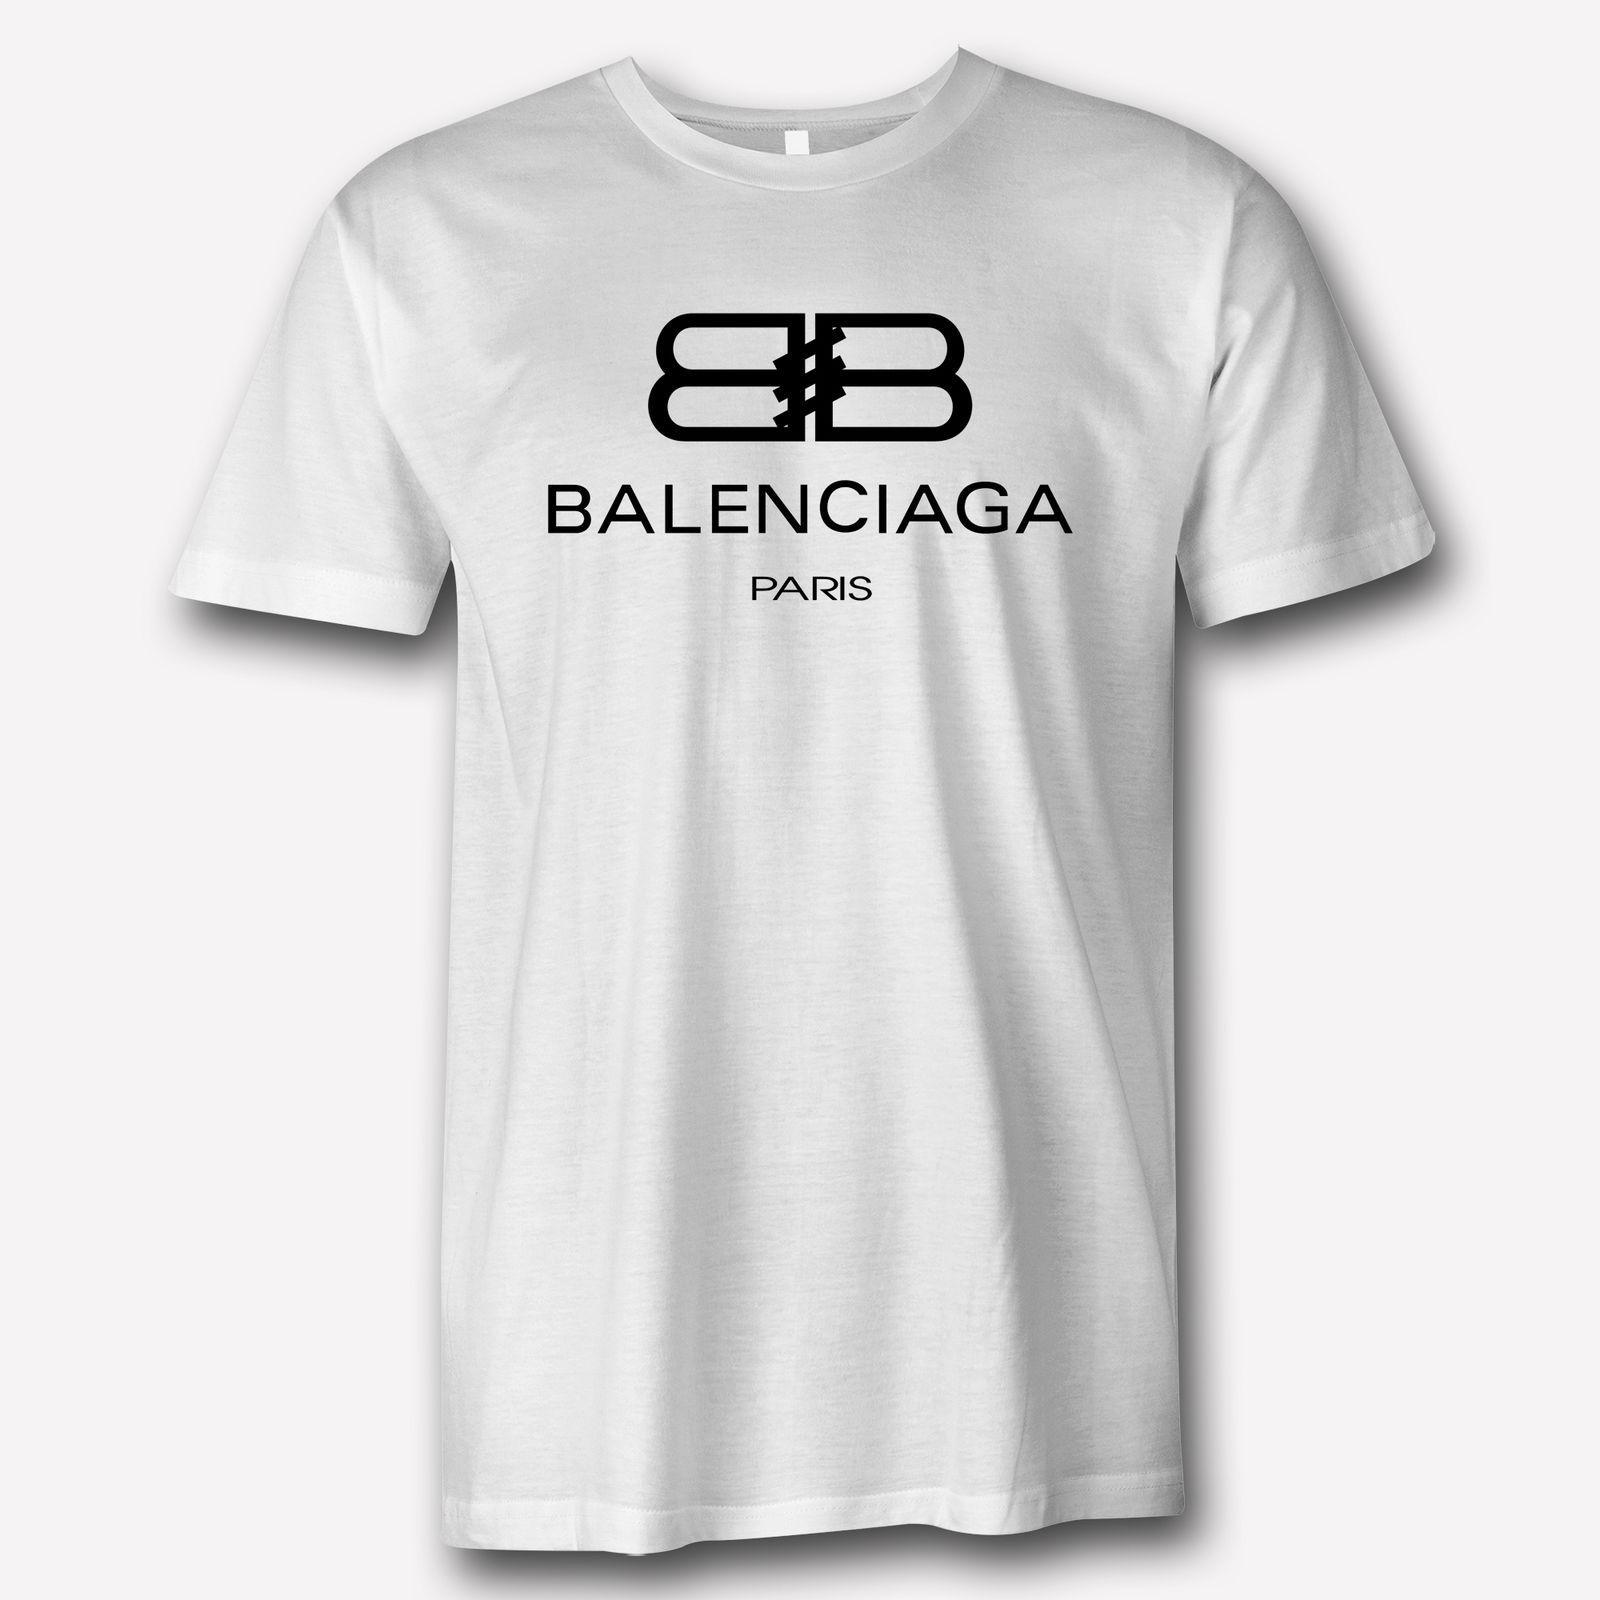 3e901955 New 1Balenciaga Paris Famous Apparel logo White T Shirt 2018 Men'S Lastest  Fashion Short Sleeve Printed funny T-shirt Quality Cotton Hip